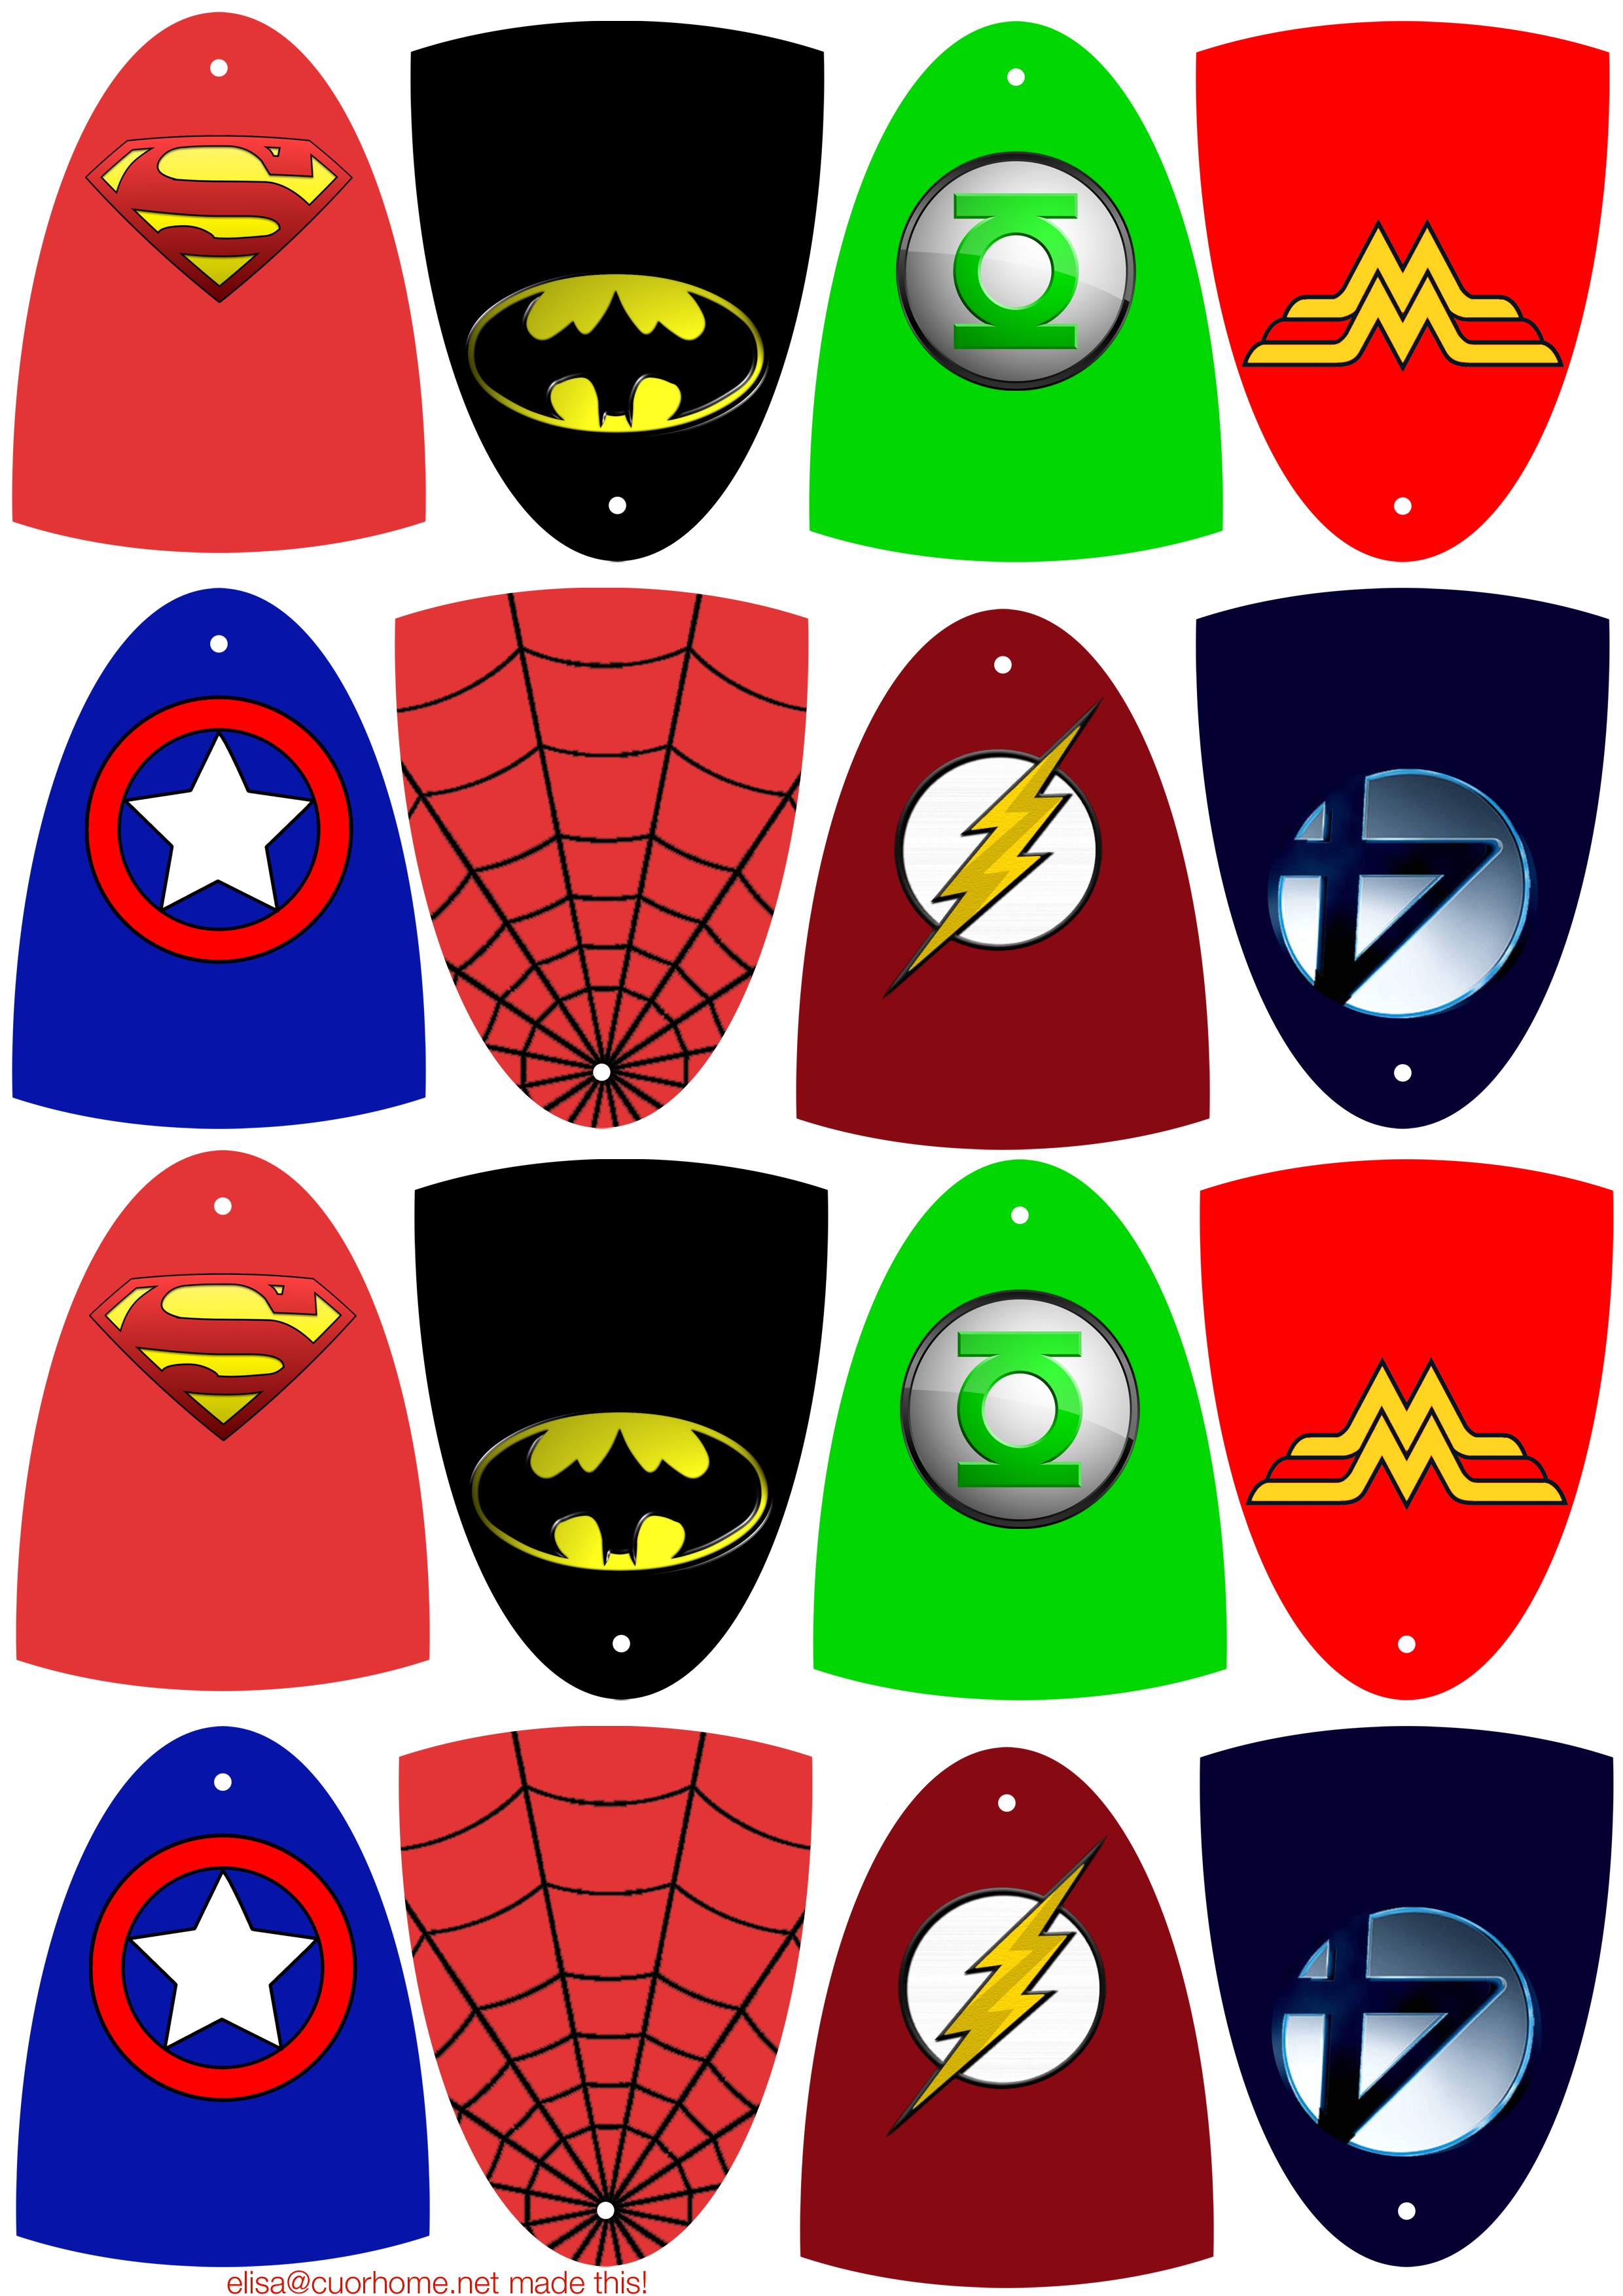 Free Superhero Printables Clipart Collection - Free Printable Superhero Pictures